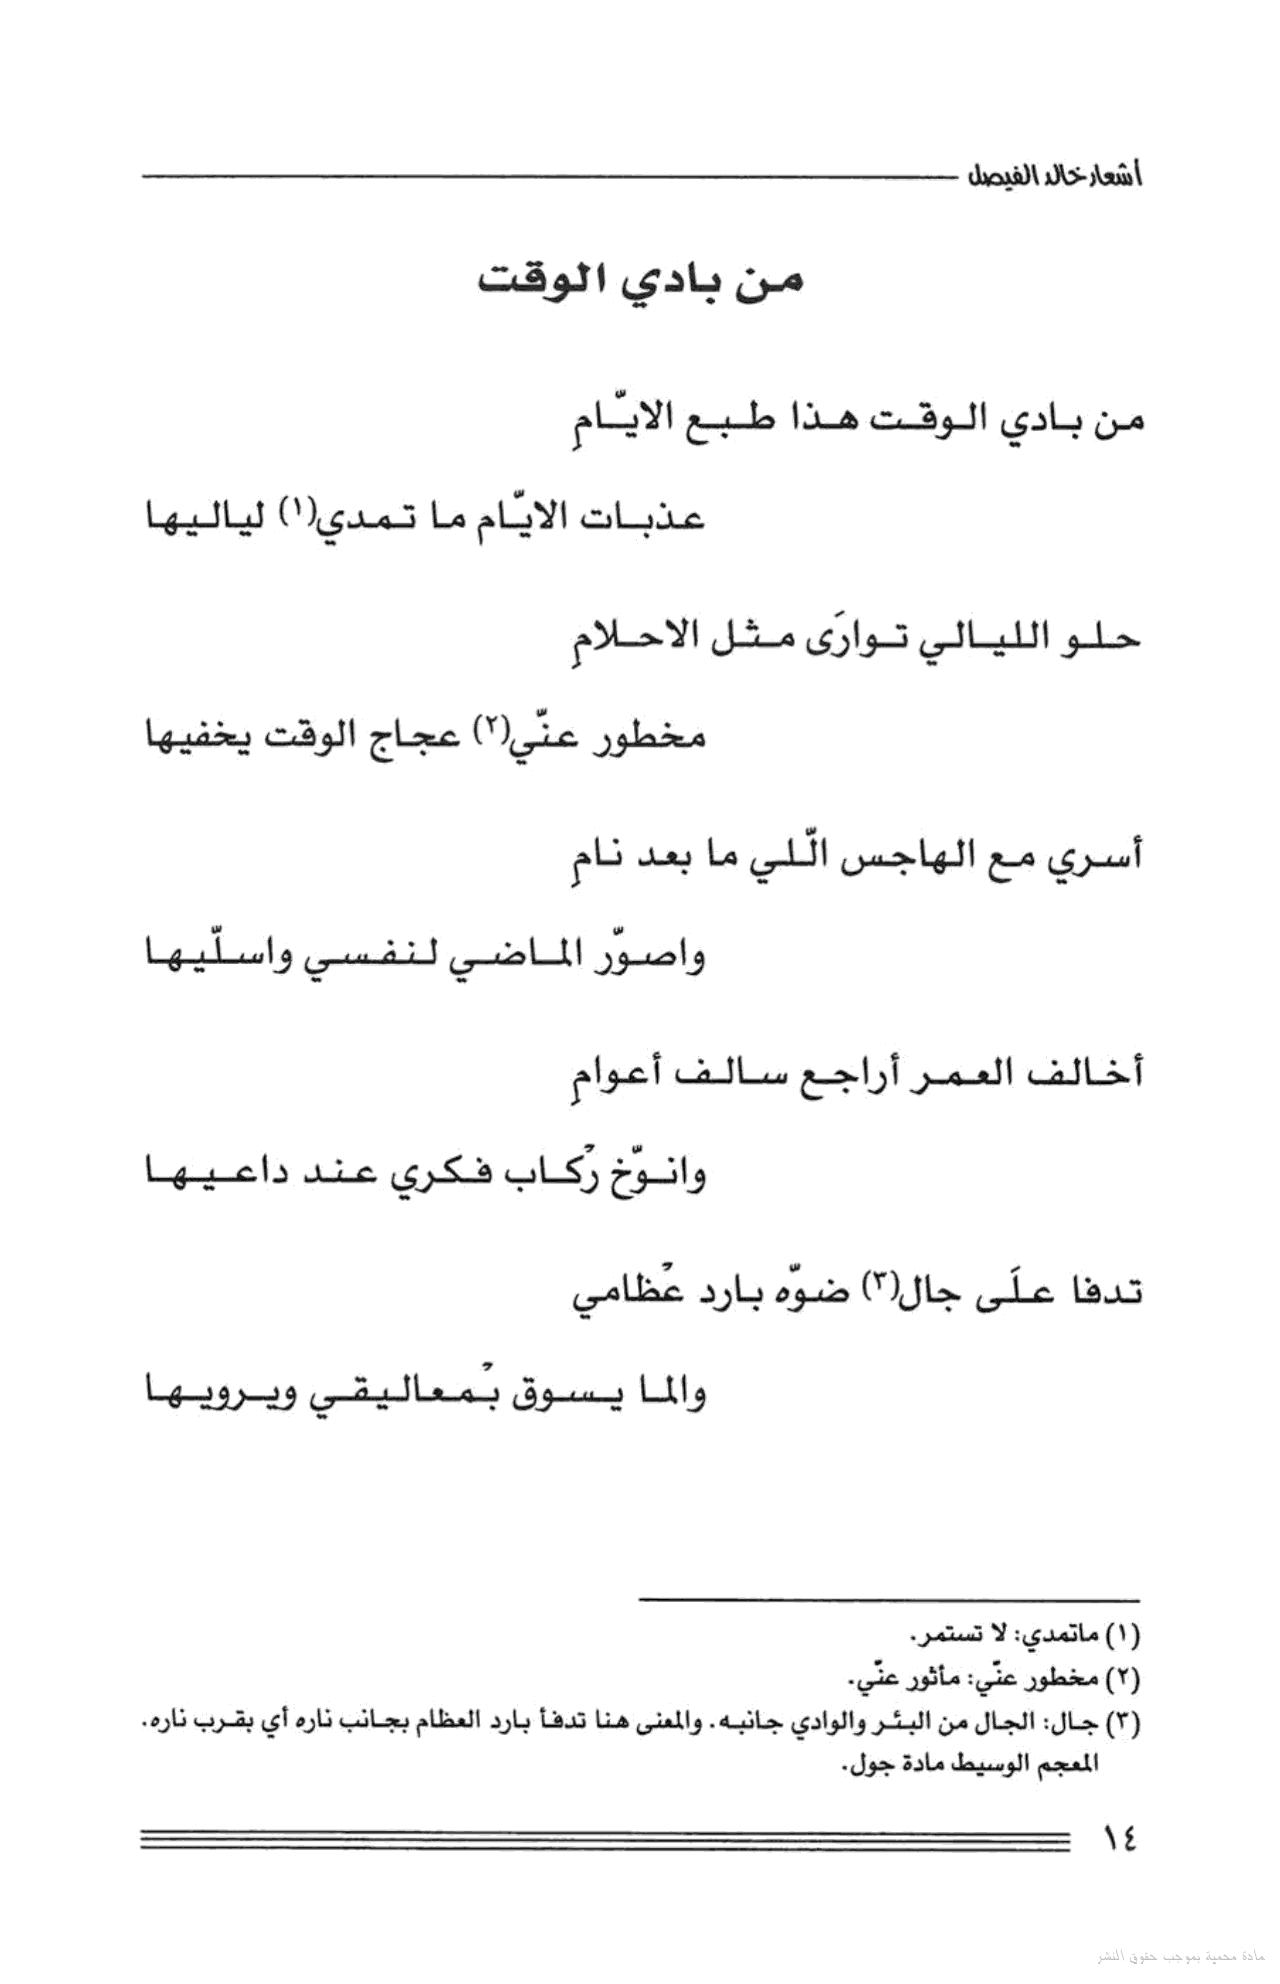 أشعار خالد الفيصل خالد الفيصل خالد الفيصل بن عبد العزيز كتب Google Photo Quotes Quotes Photo